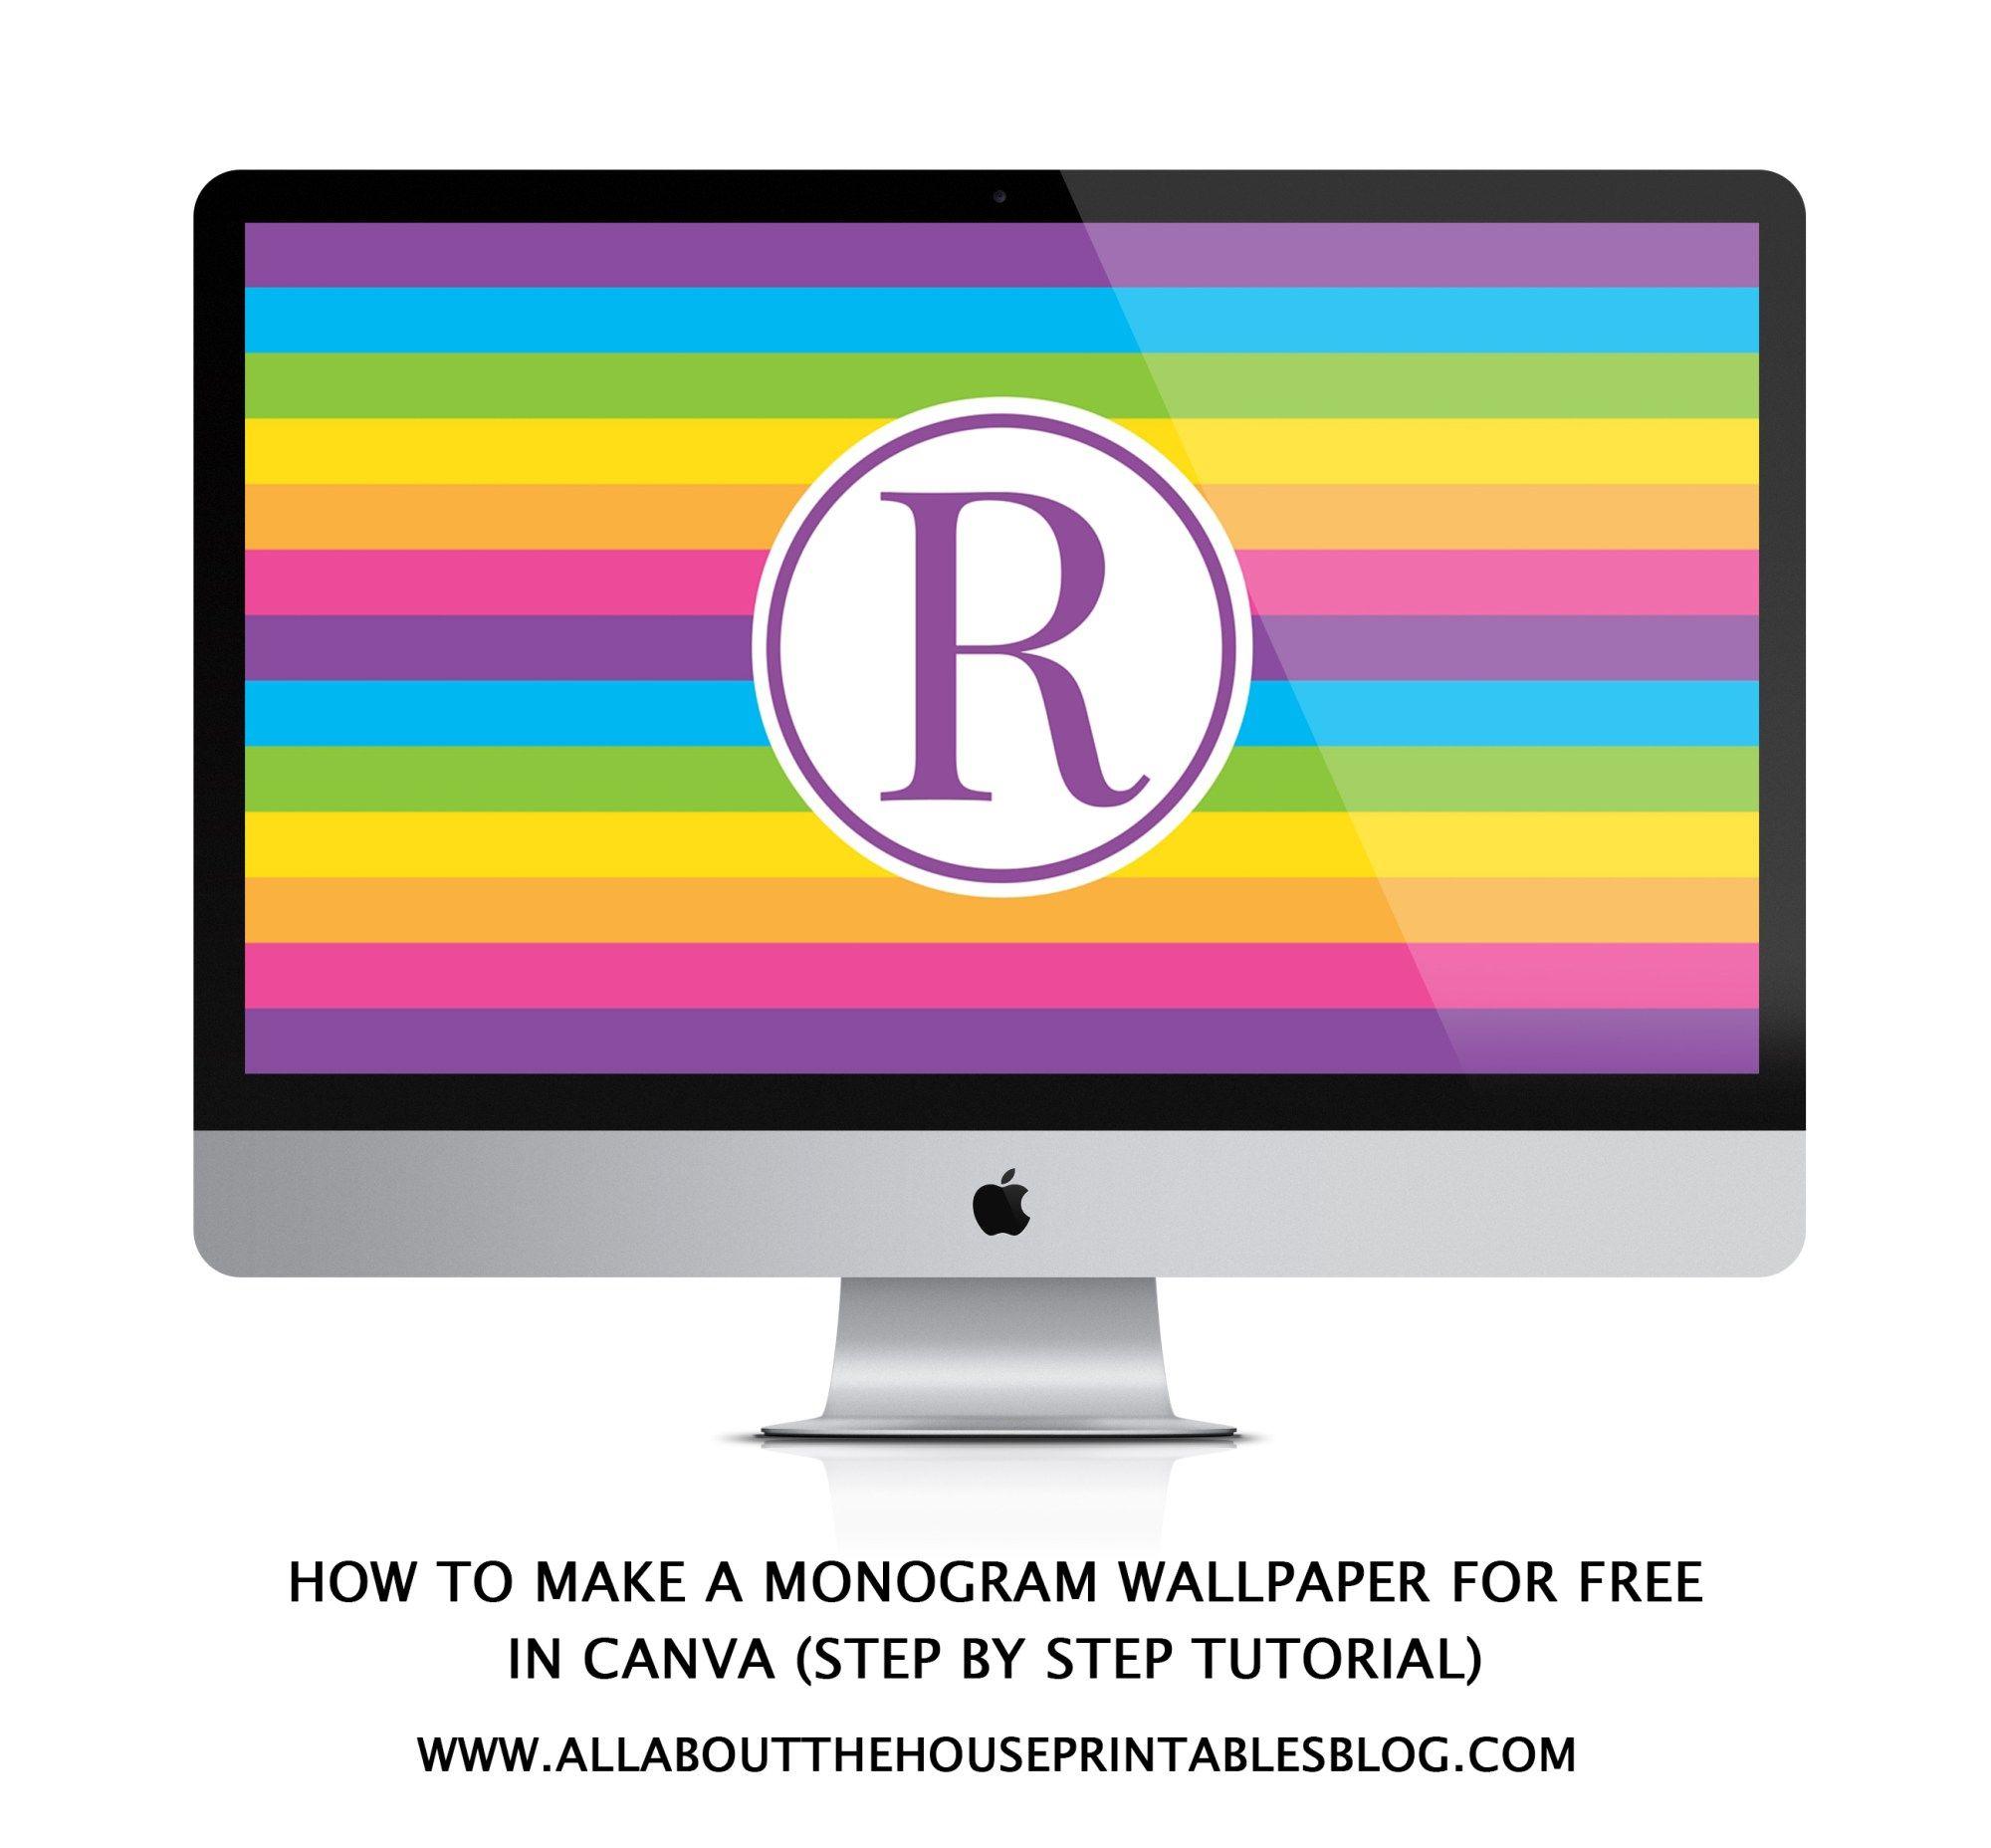 How To Make A Monogram Desktop Wallpaper Free Tutorial Set As Laptop Computer Background Iphone Ipad Tablet Screensaver Rainbow Preppy